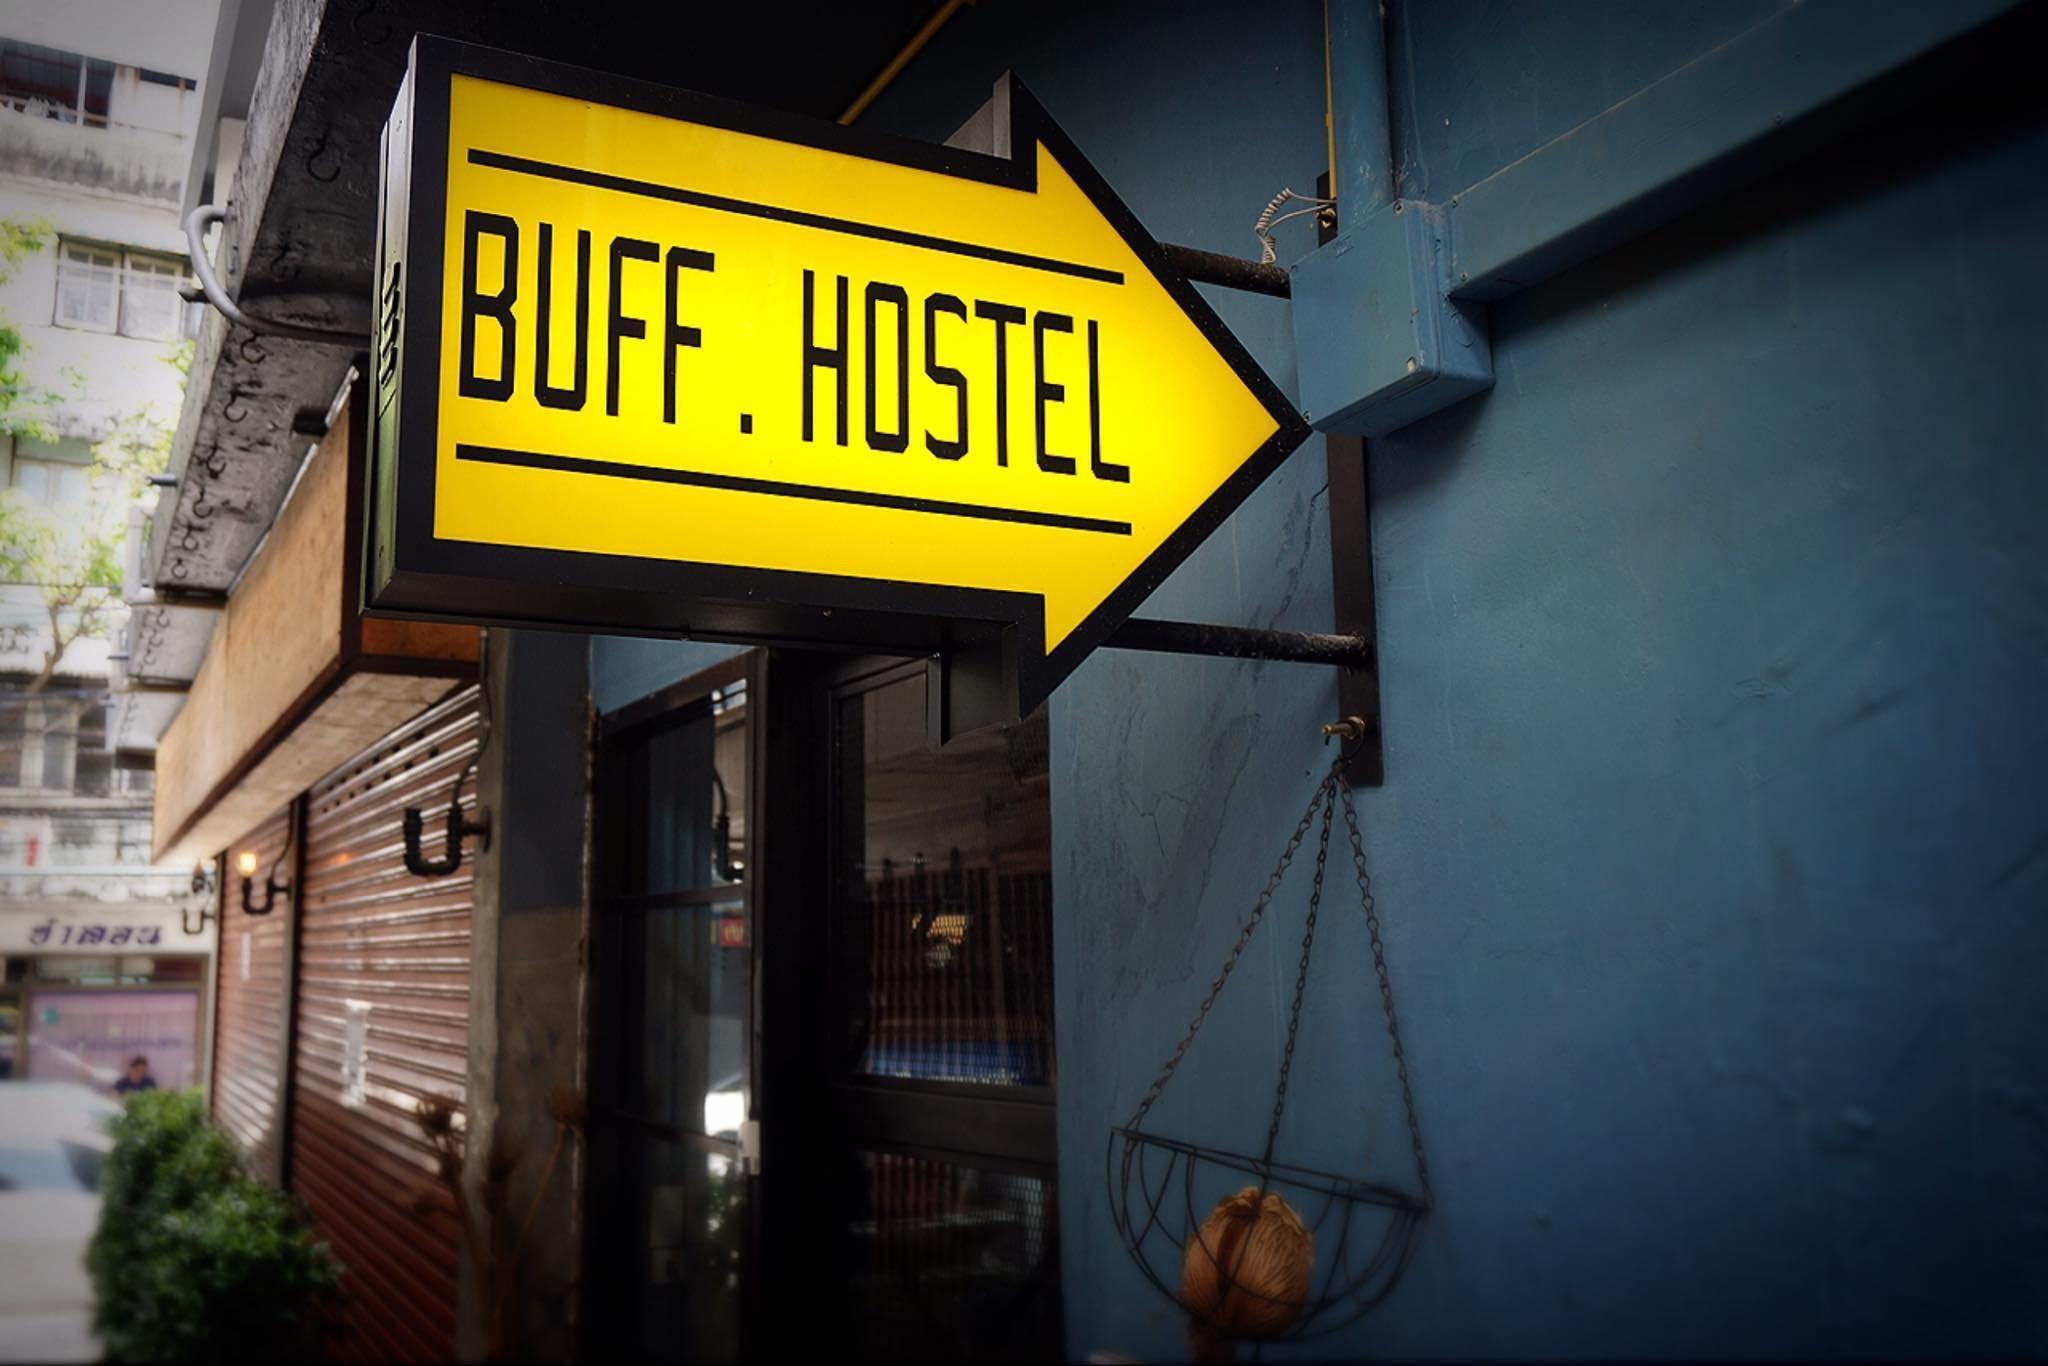 Buff Hostel